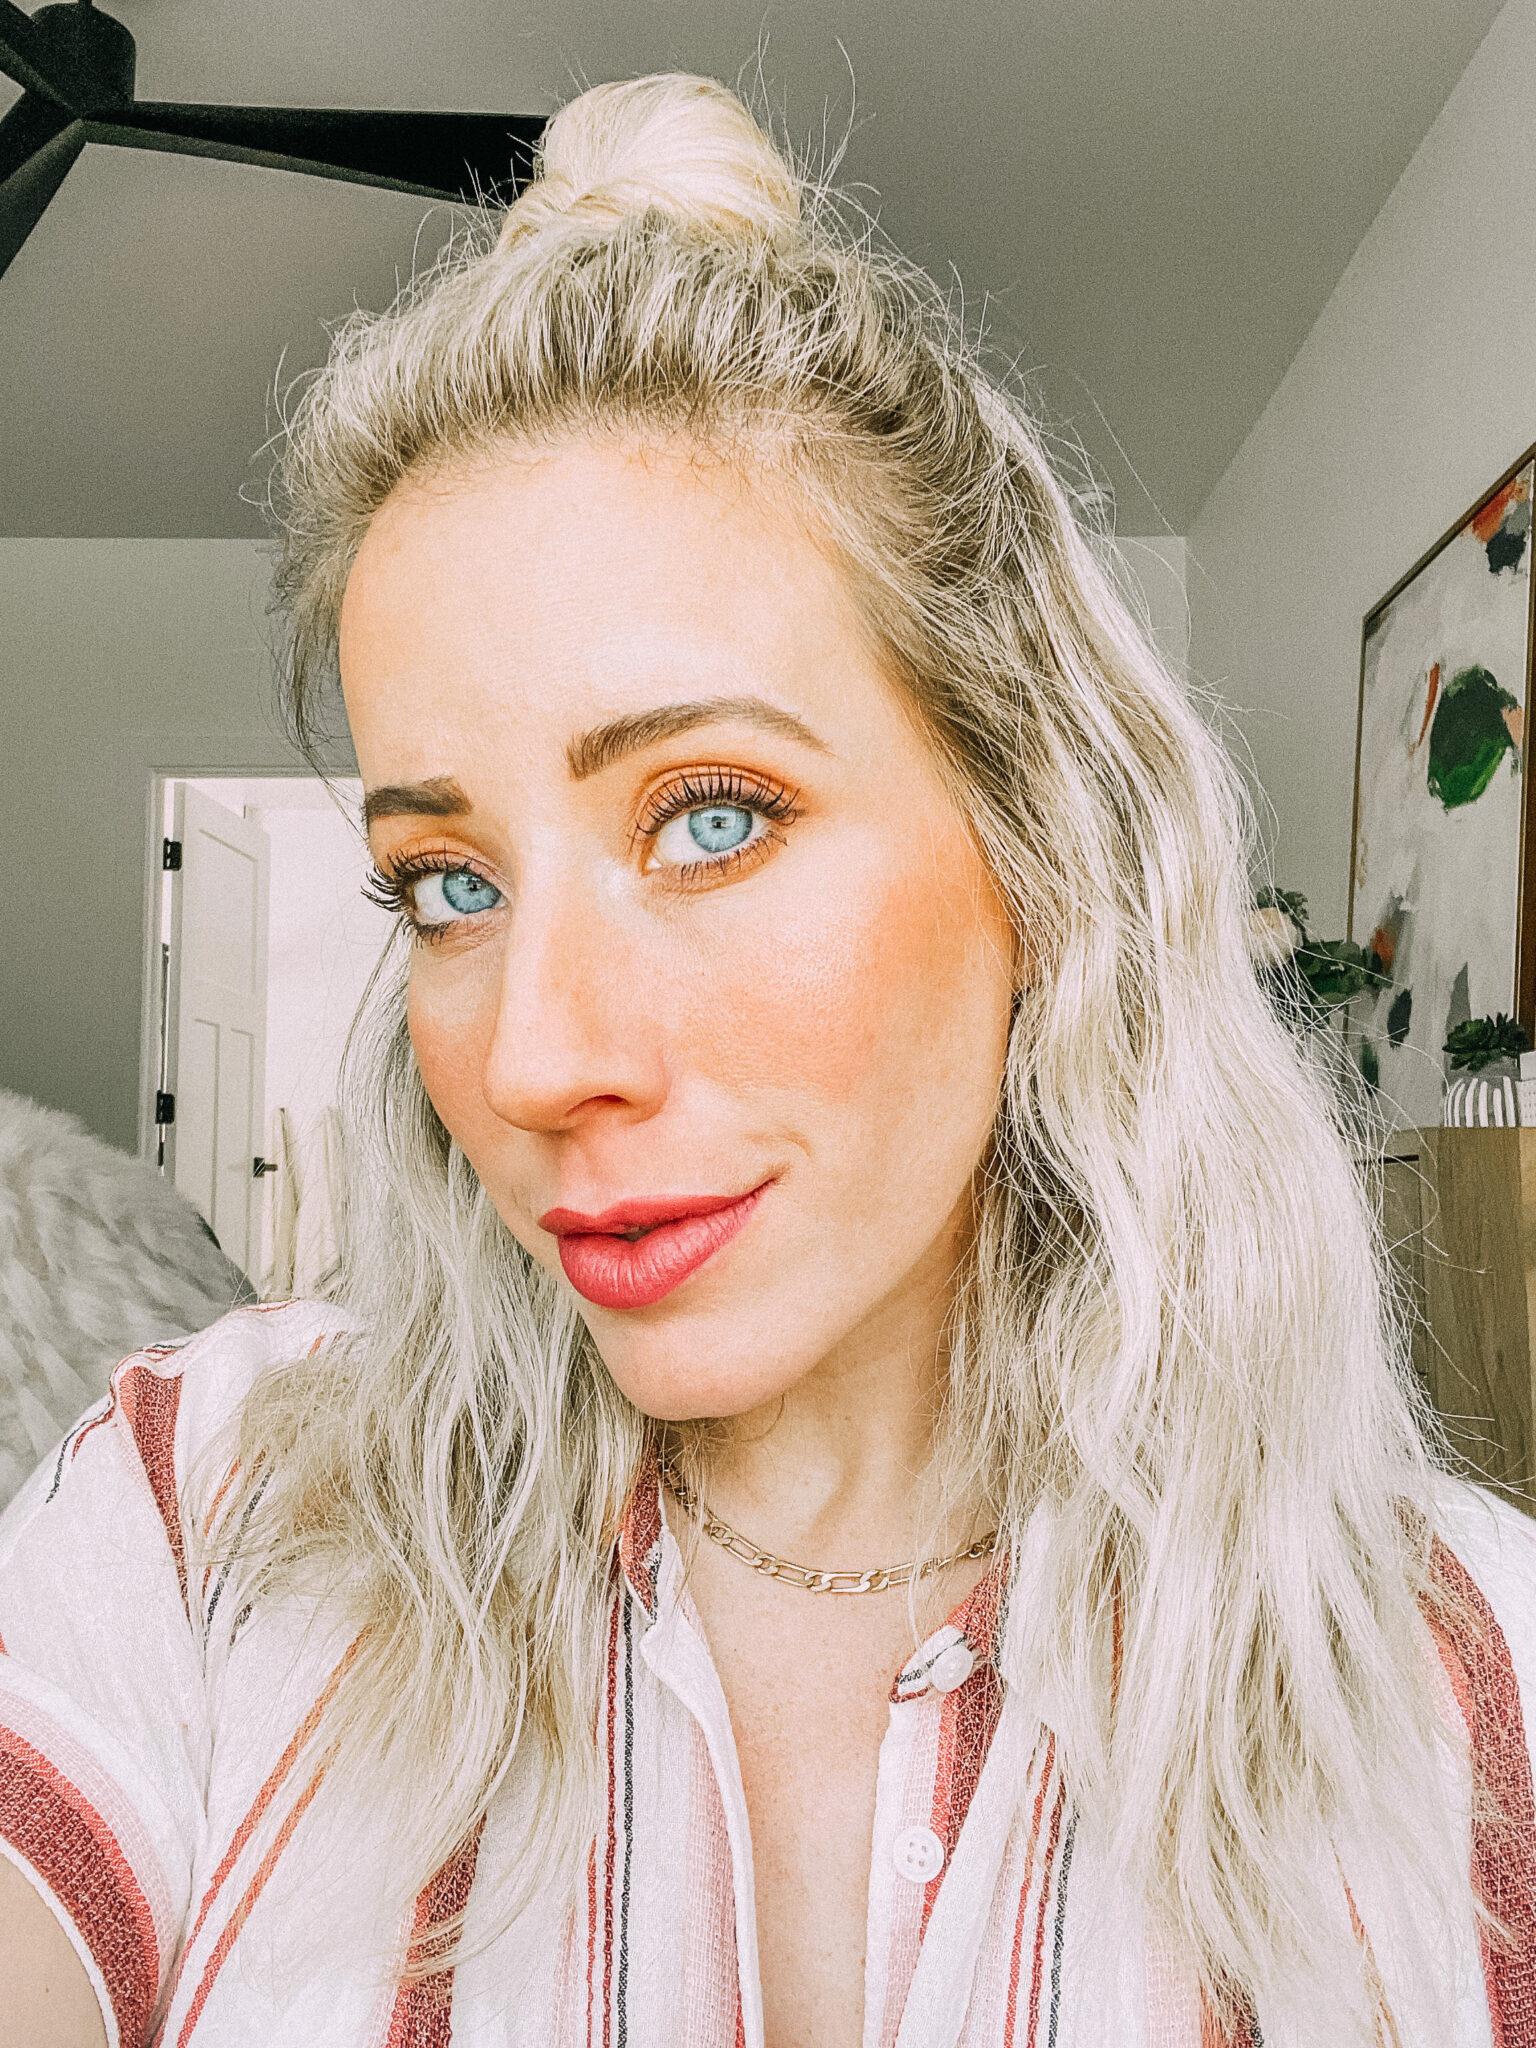 How to get gorgeous lashes with my eyelash hacks twistmepretty.com